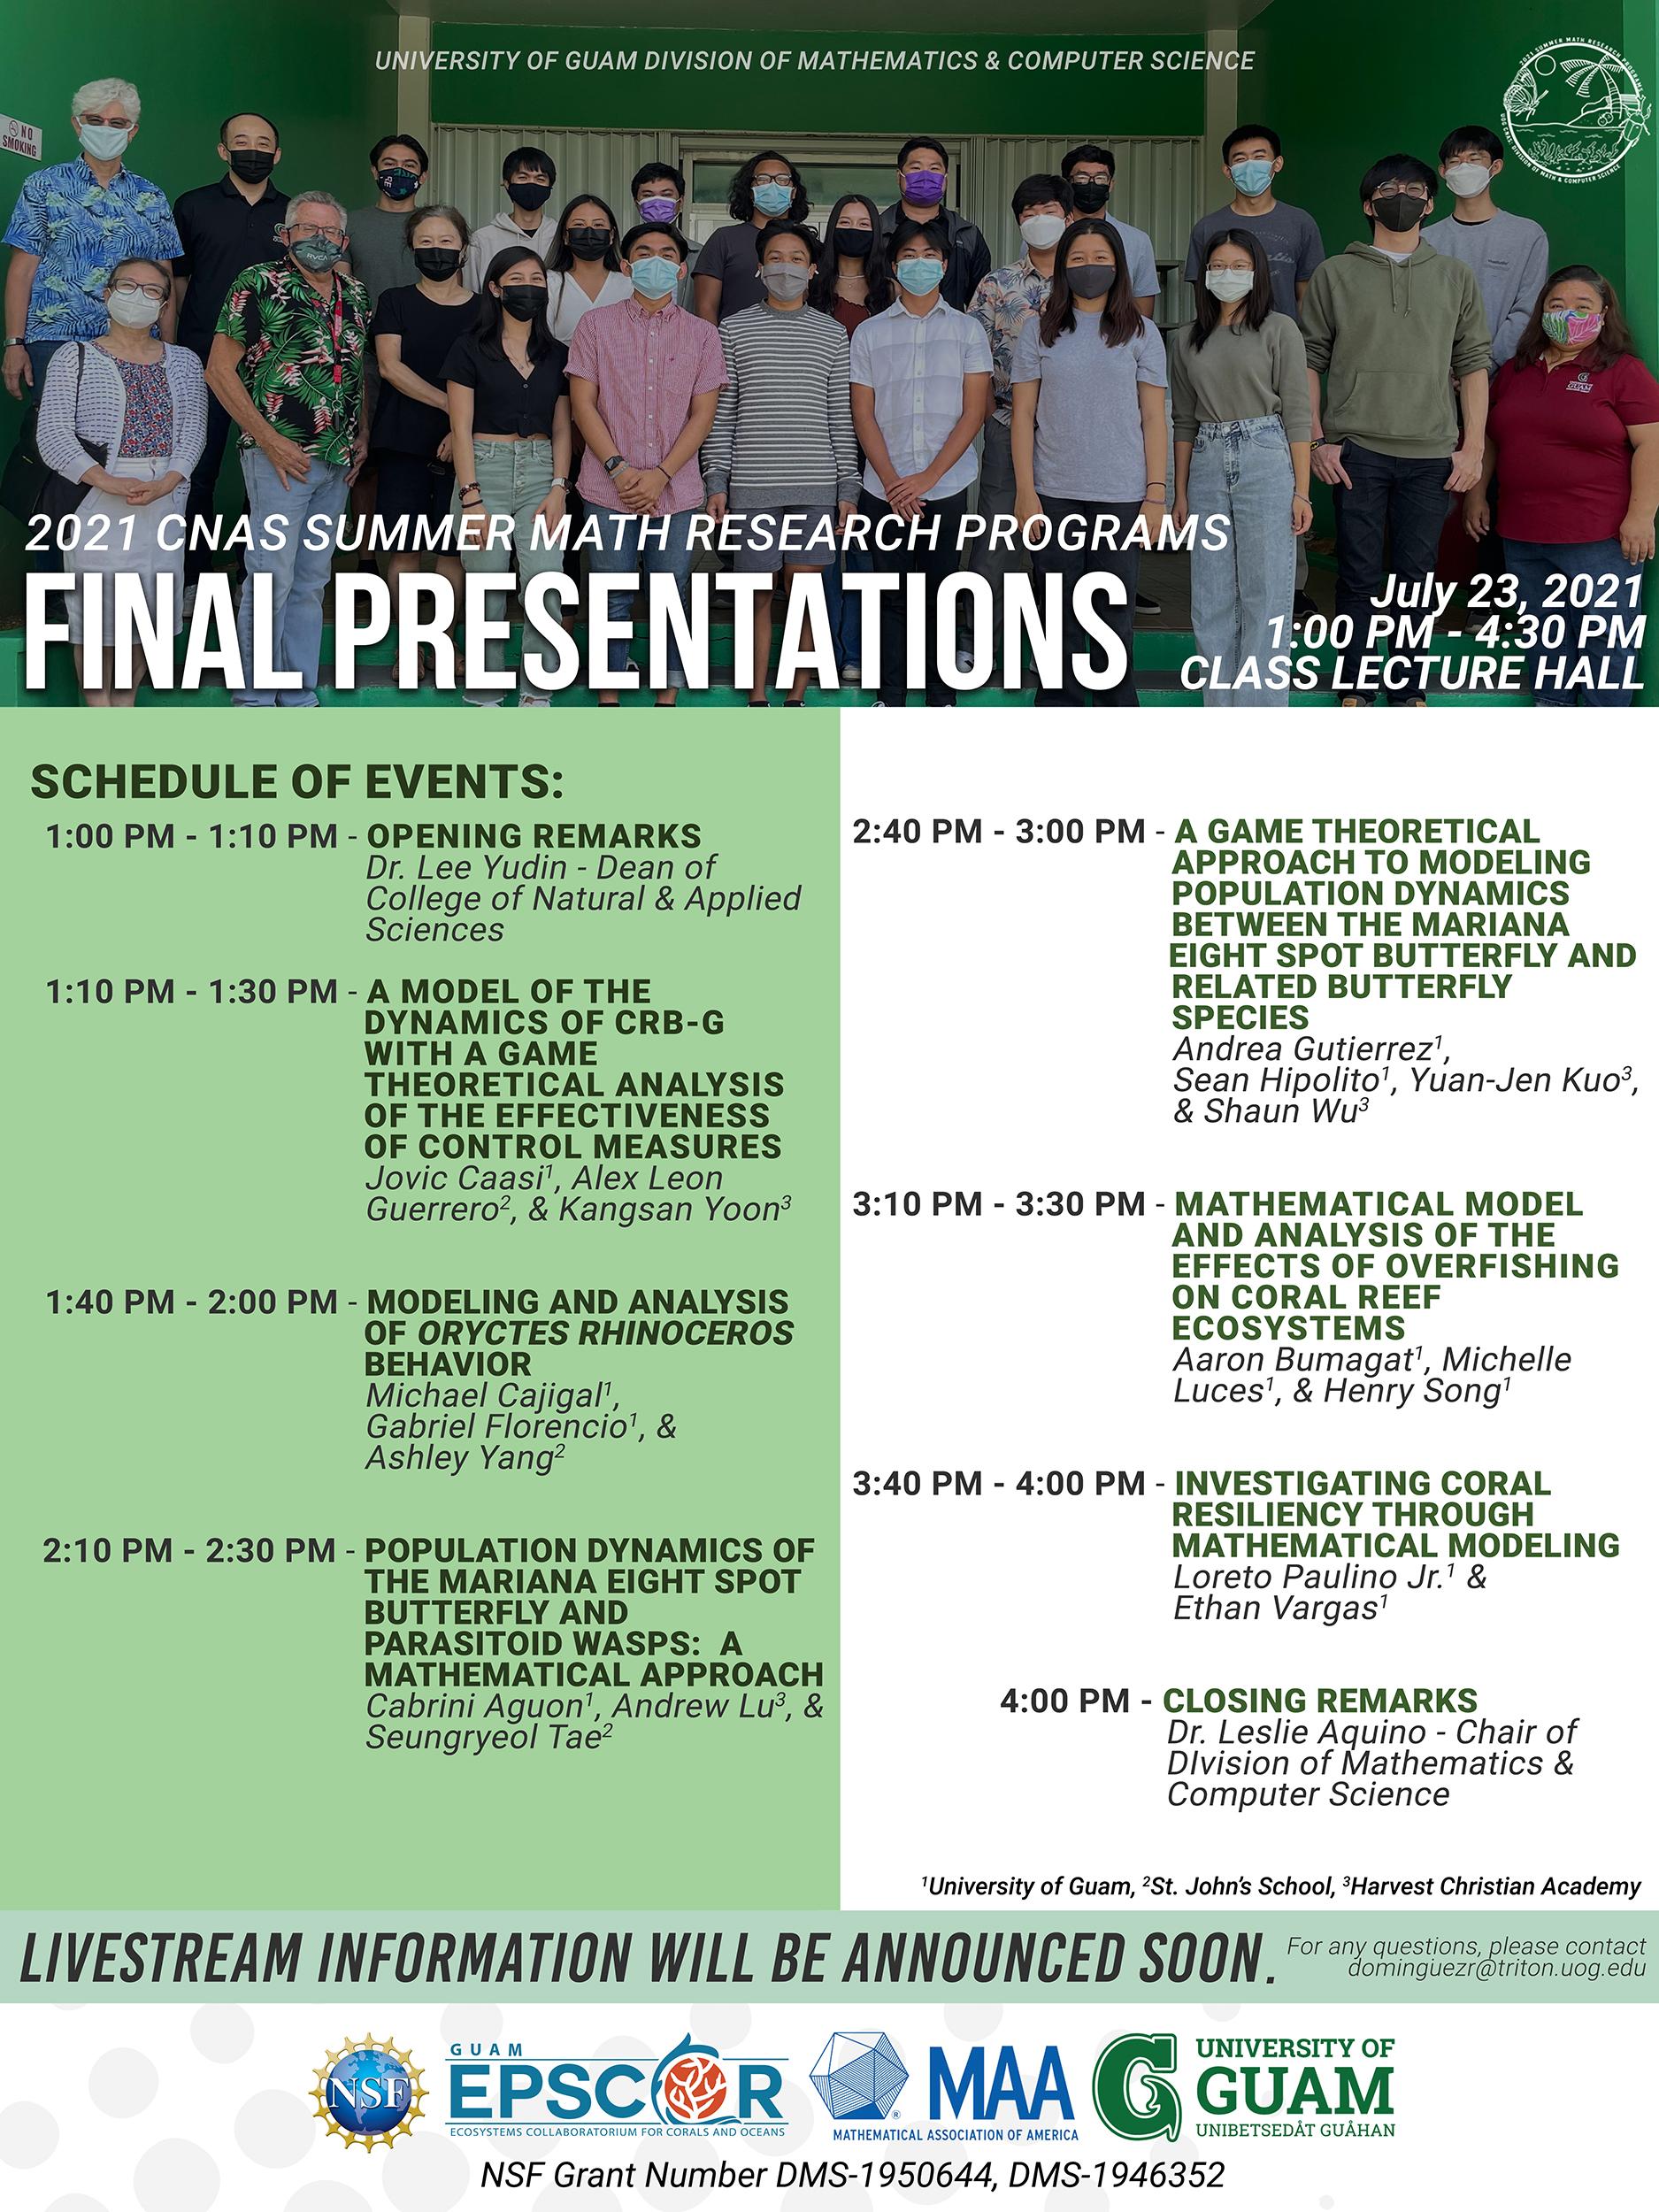 2021 CNAS Summer Math Research Programs Final Presentations